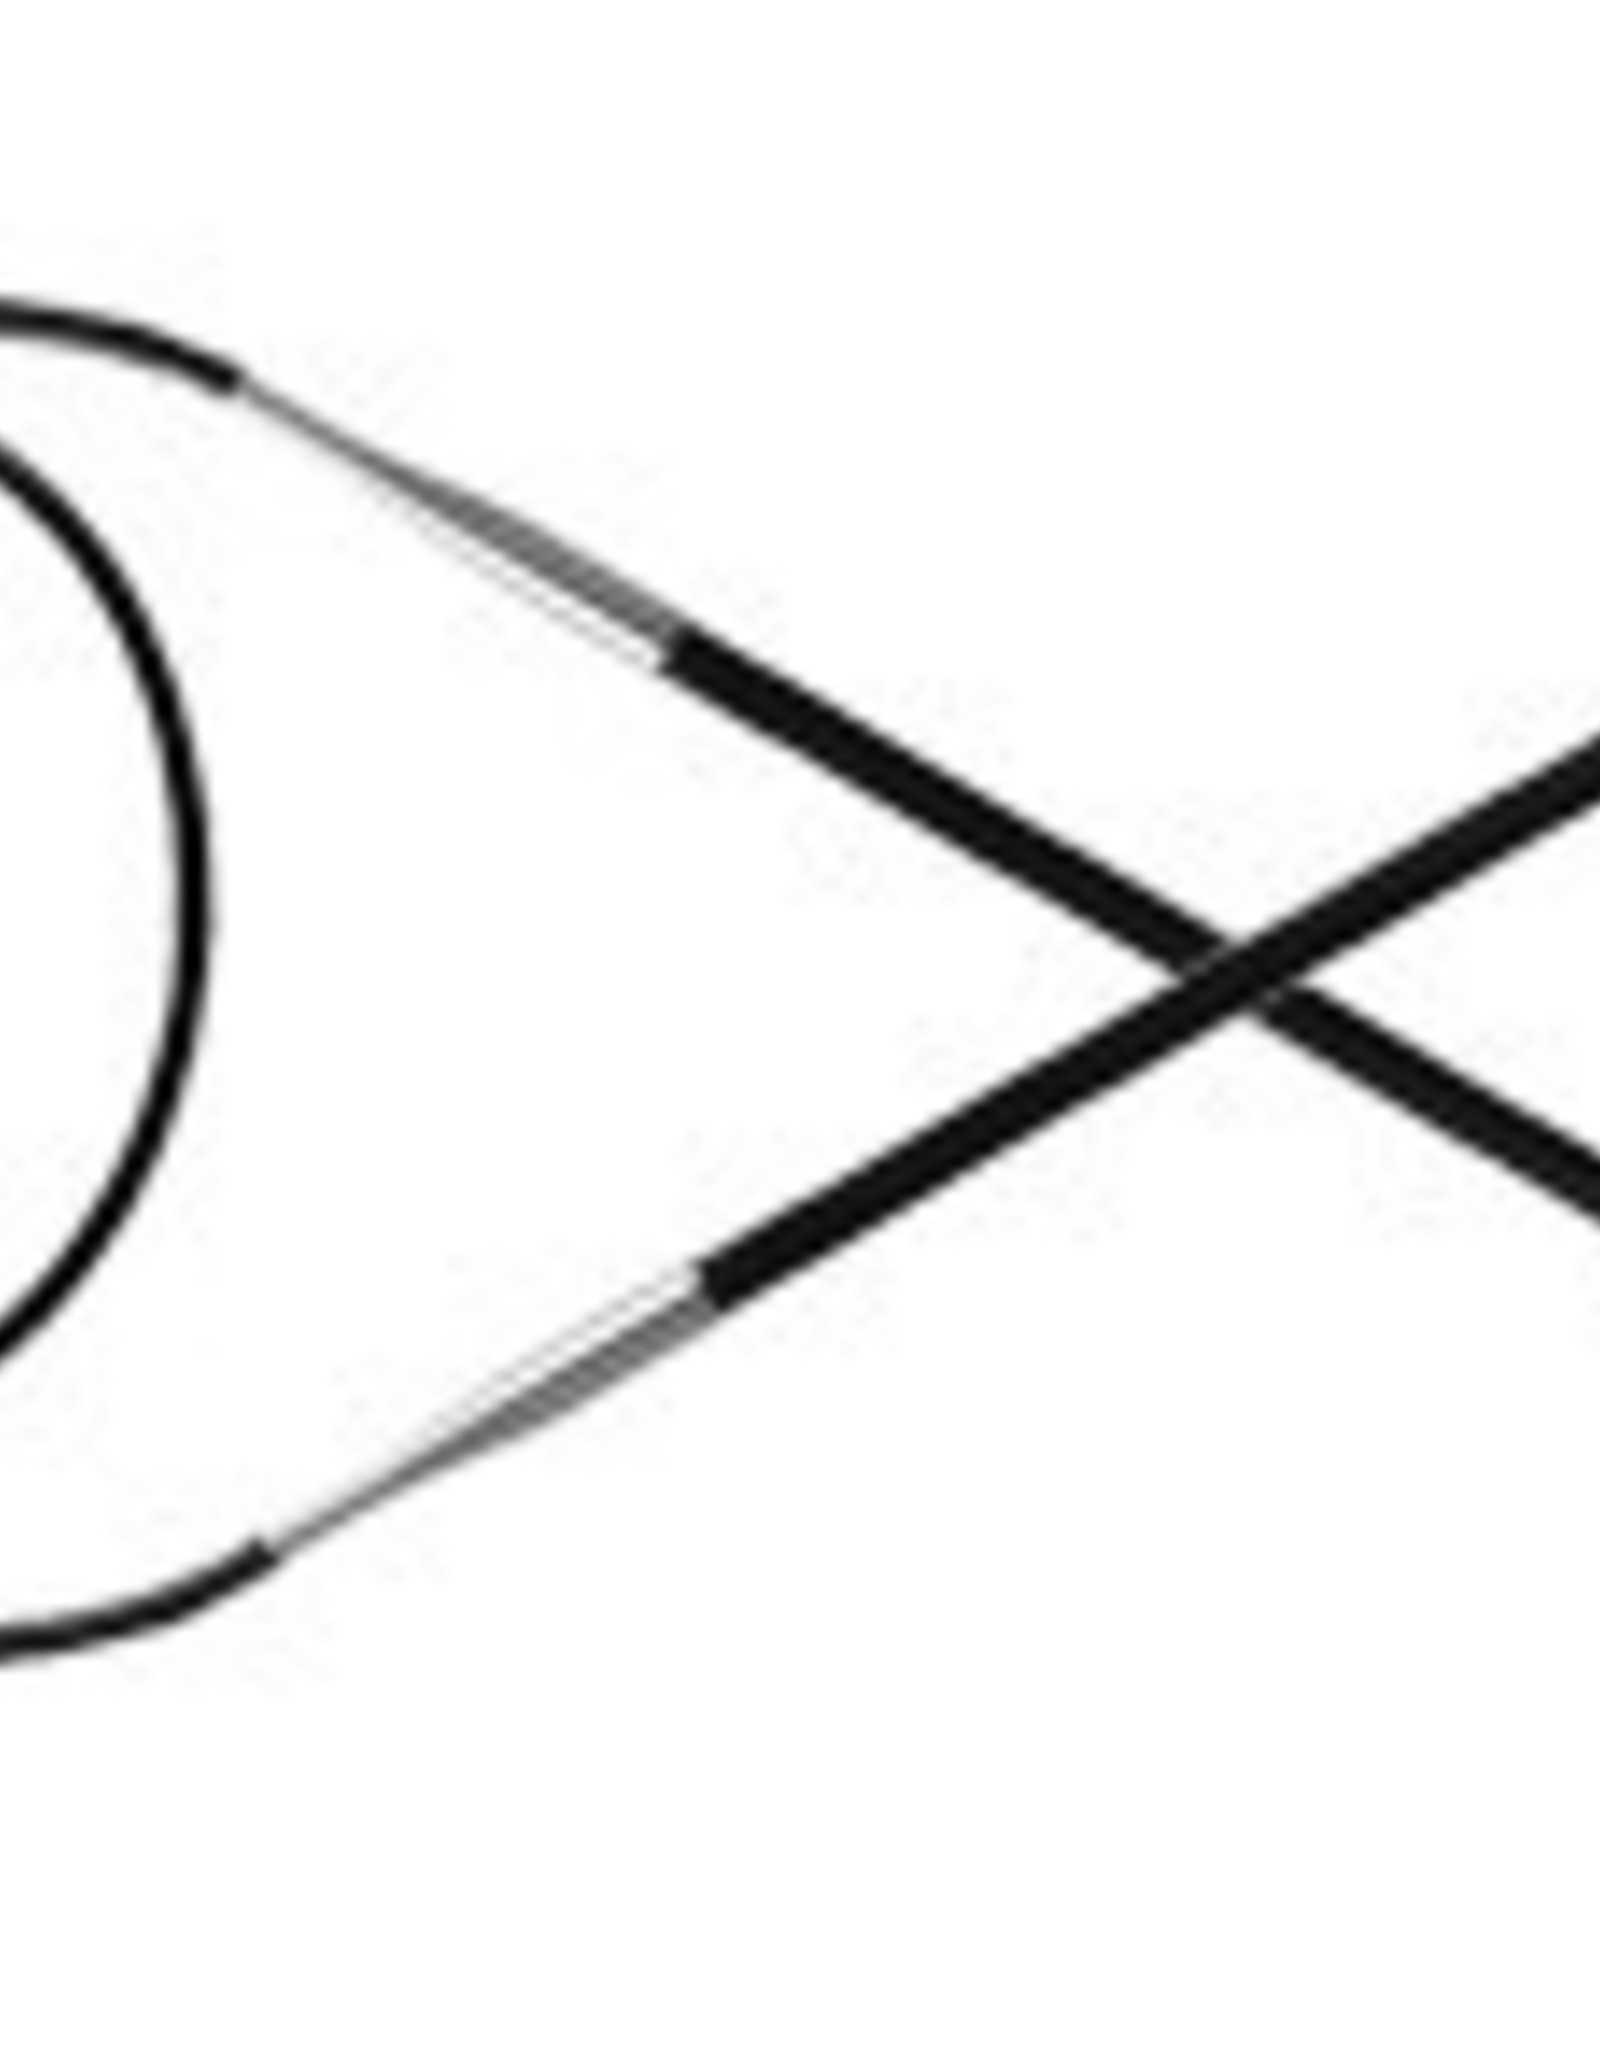 Knitter's Pride 11 Karbonz Circular 32